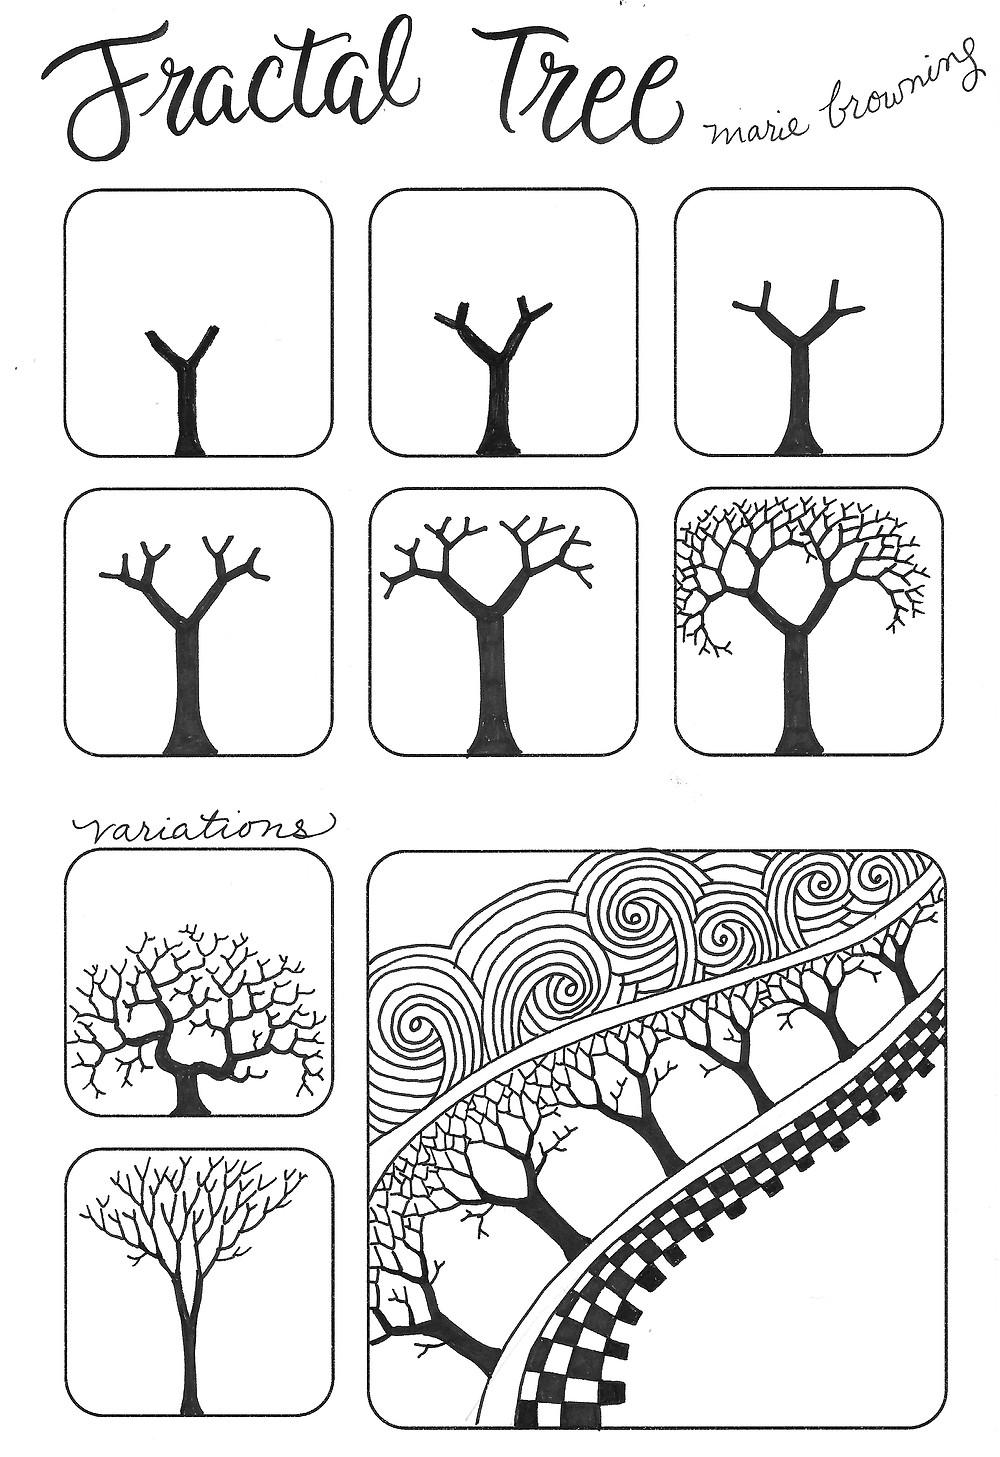 @mariebcreates #tombow #zentangleart fractal tree zentangle drawing